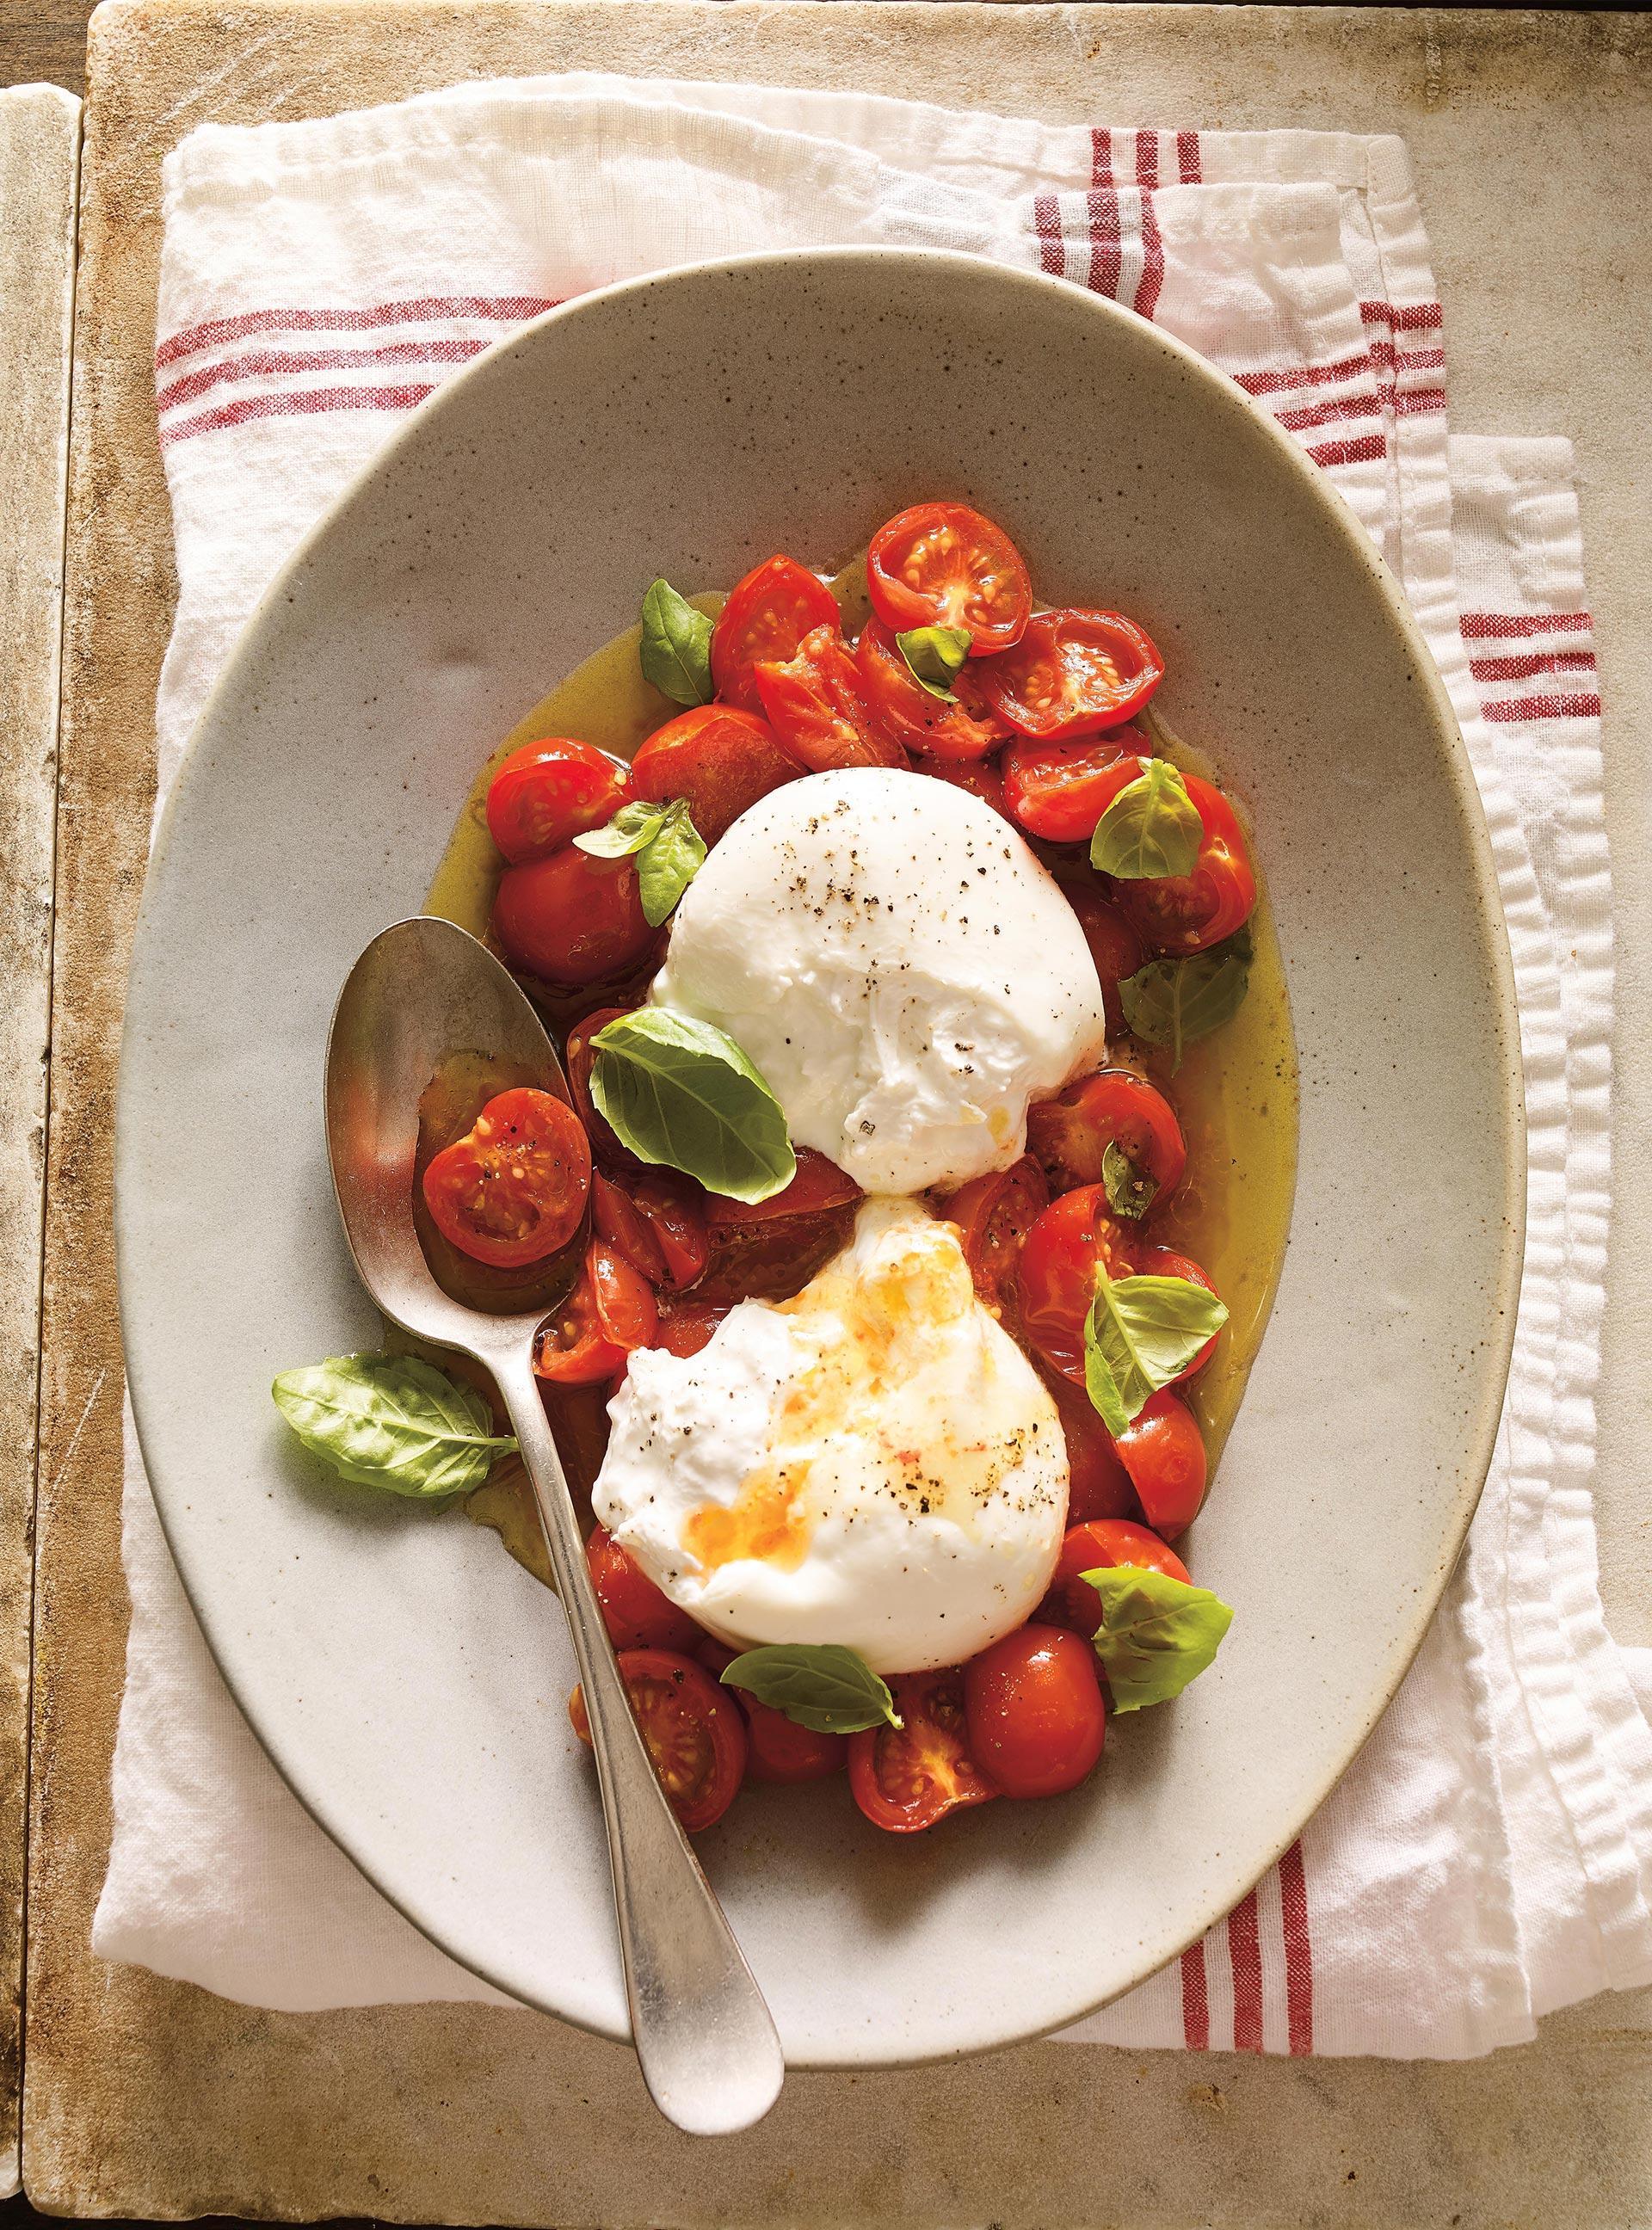 Burrata la tomate cerise confite ricardo for Article de cuisine ricardo